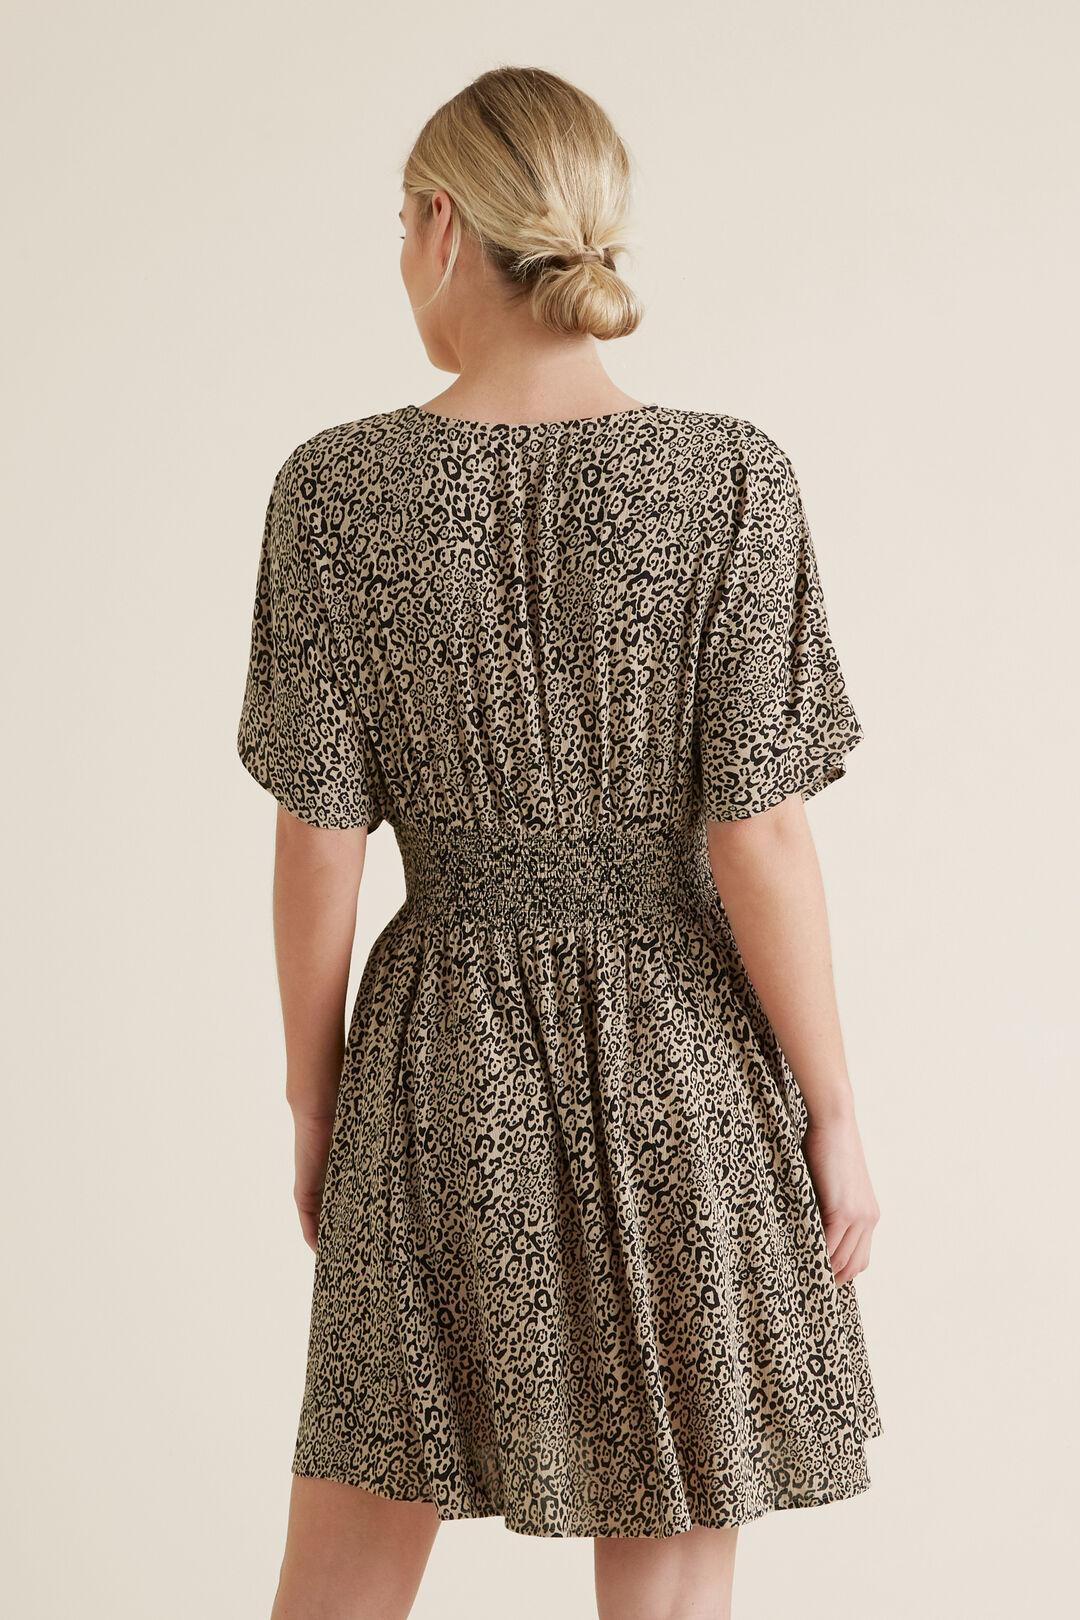 Animal Print Swing Dress    hi-res